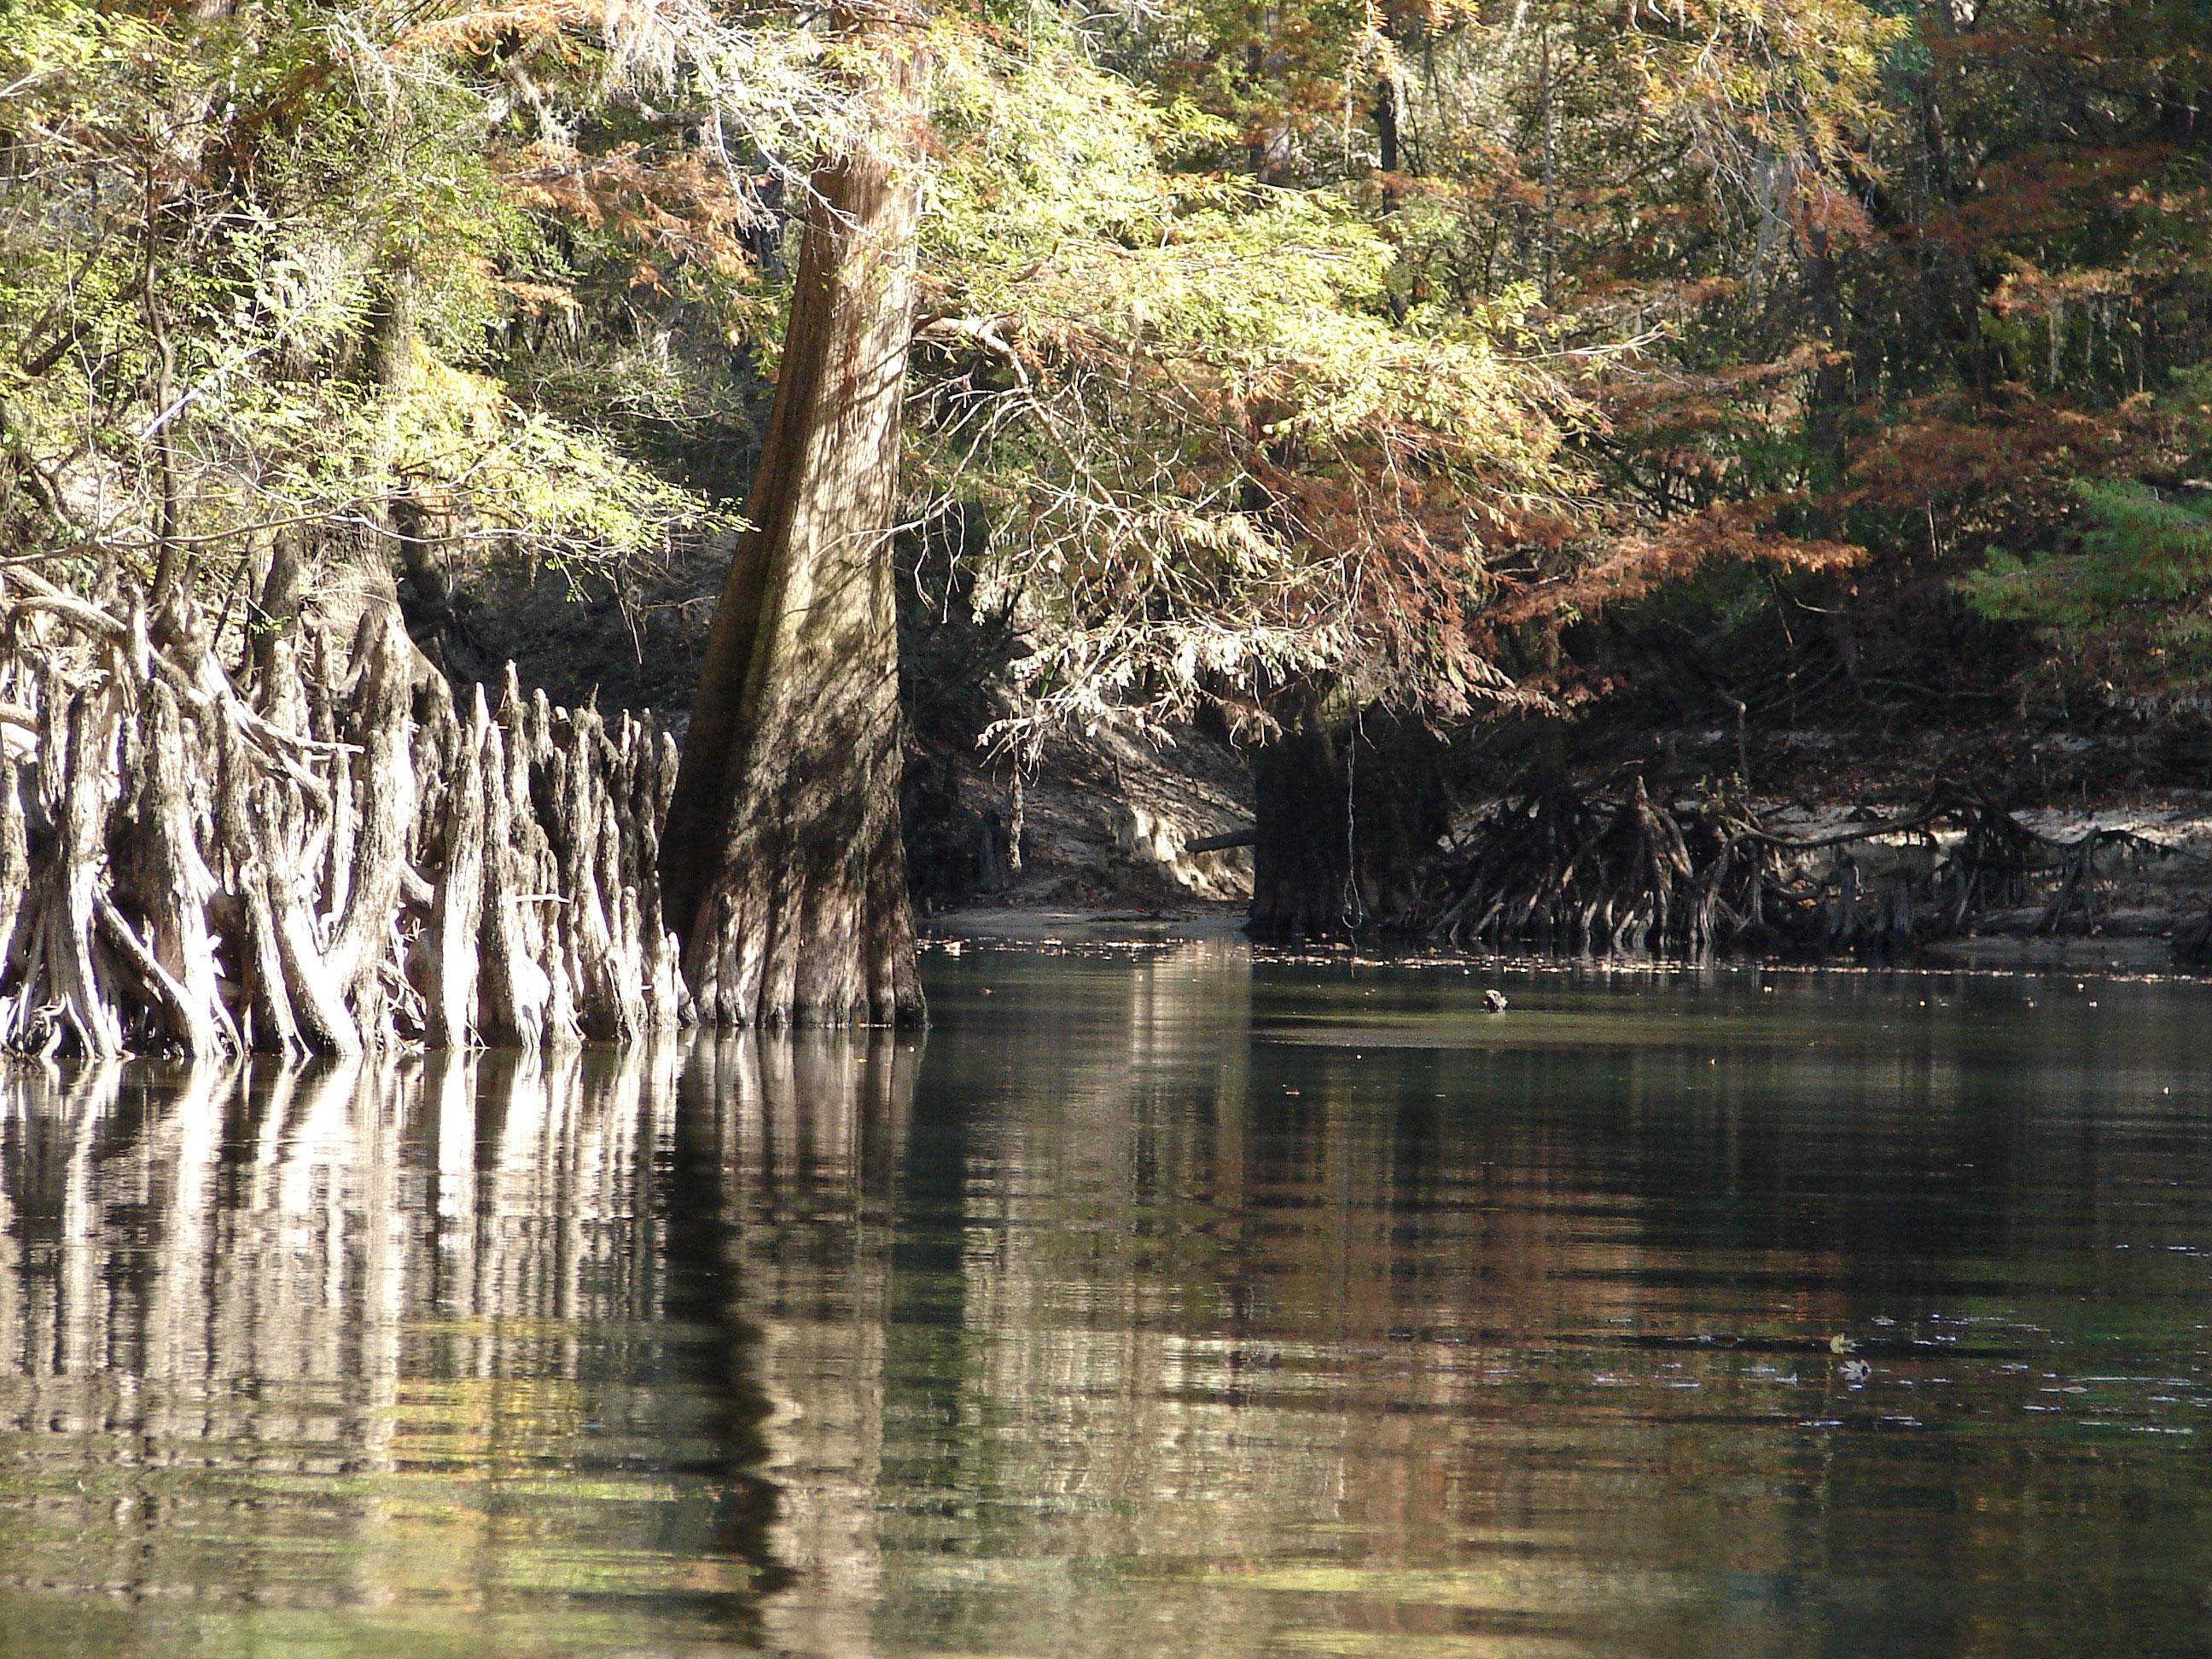 cypress-tree-with-knees-on-bend-stock-photos-florida-panhandle-chipola-river-linda-bateman